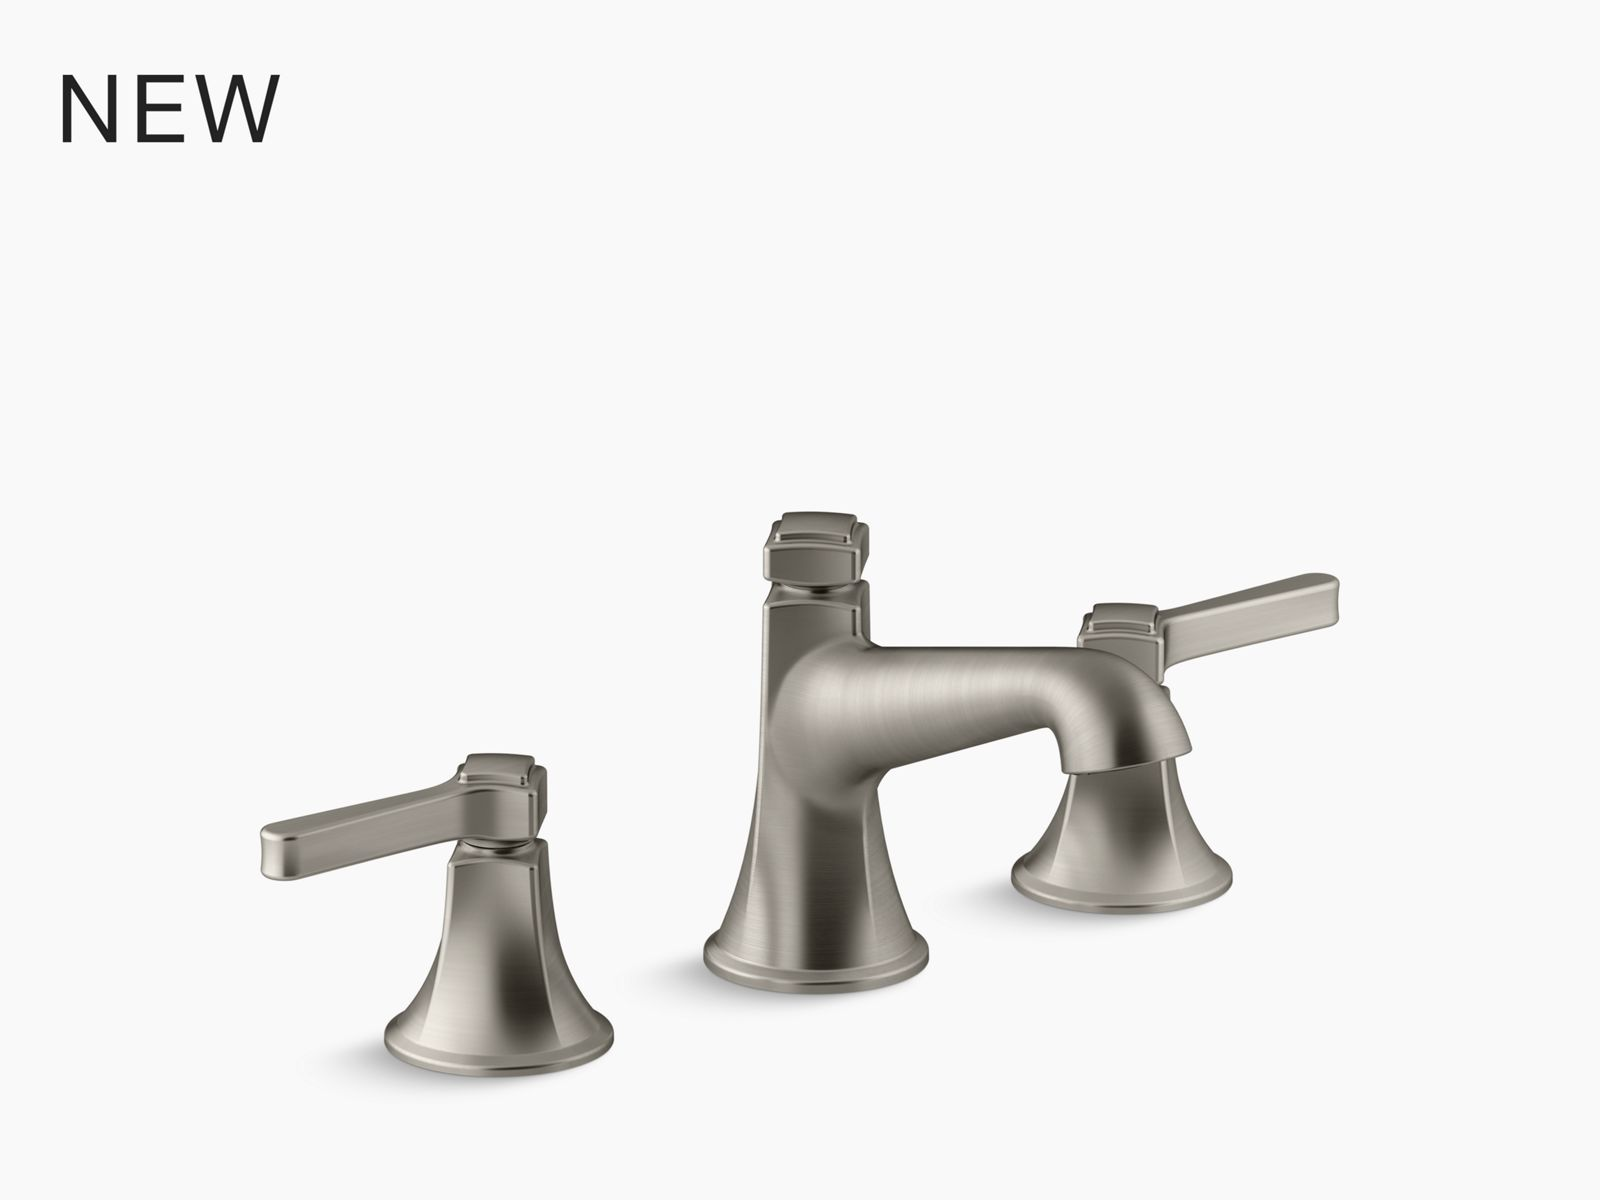 reve 23 pedestal bathroom sink with single faucet hole